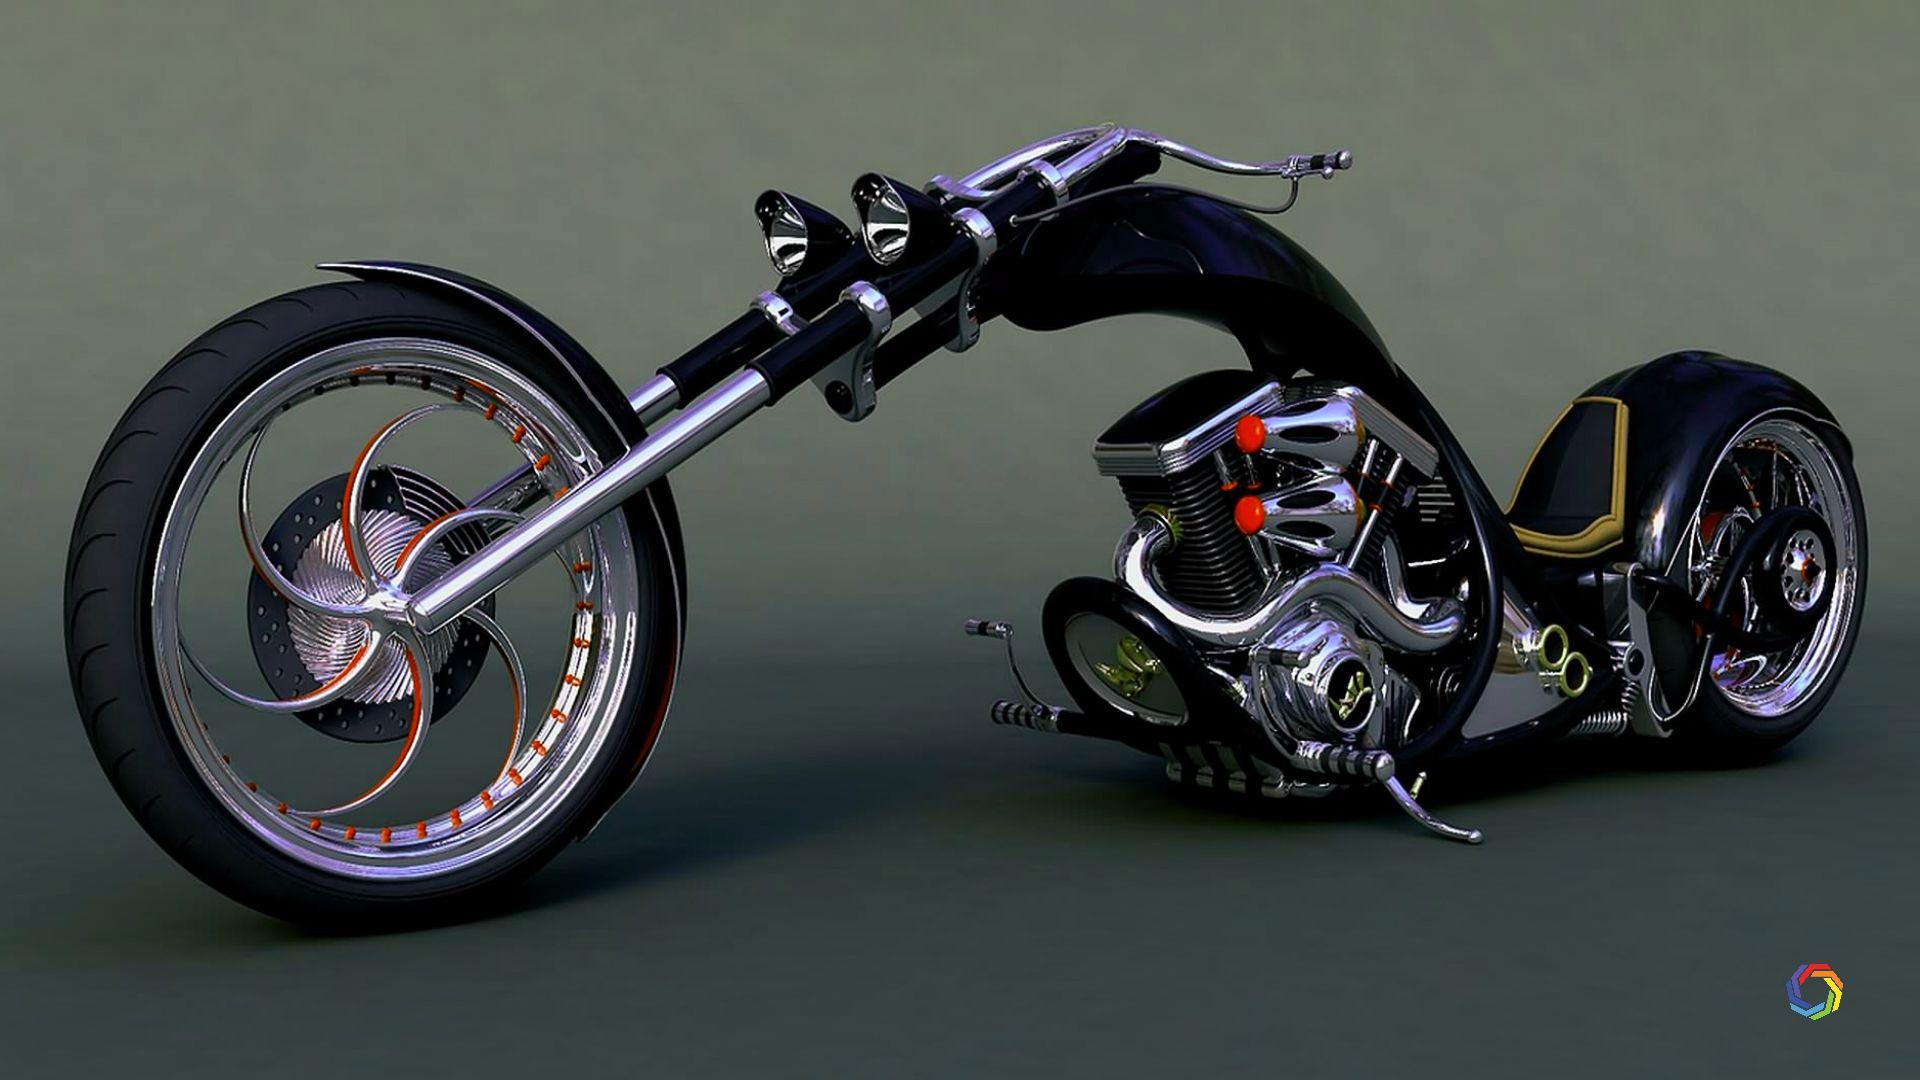 Beautiful Rocking Bikes Full Hd Wallpapers Chopper Bike Ghost Bike